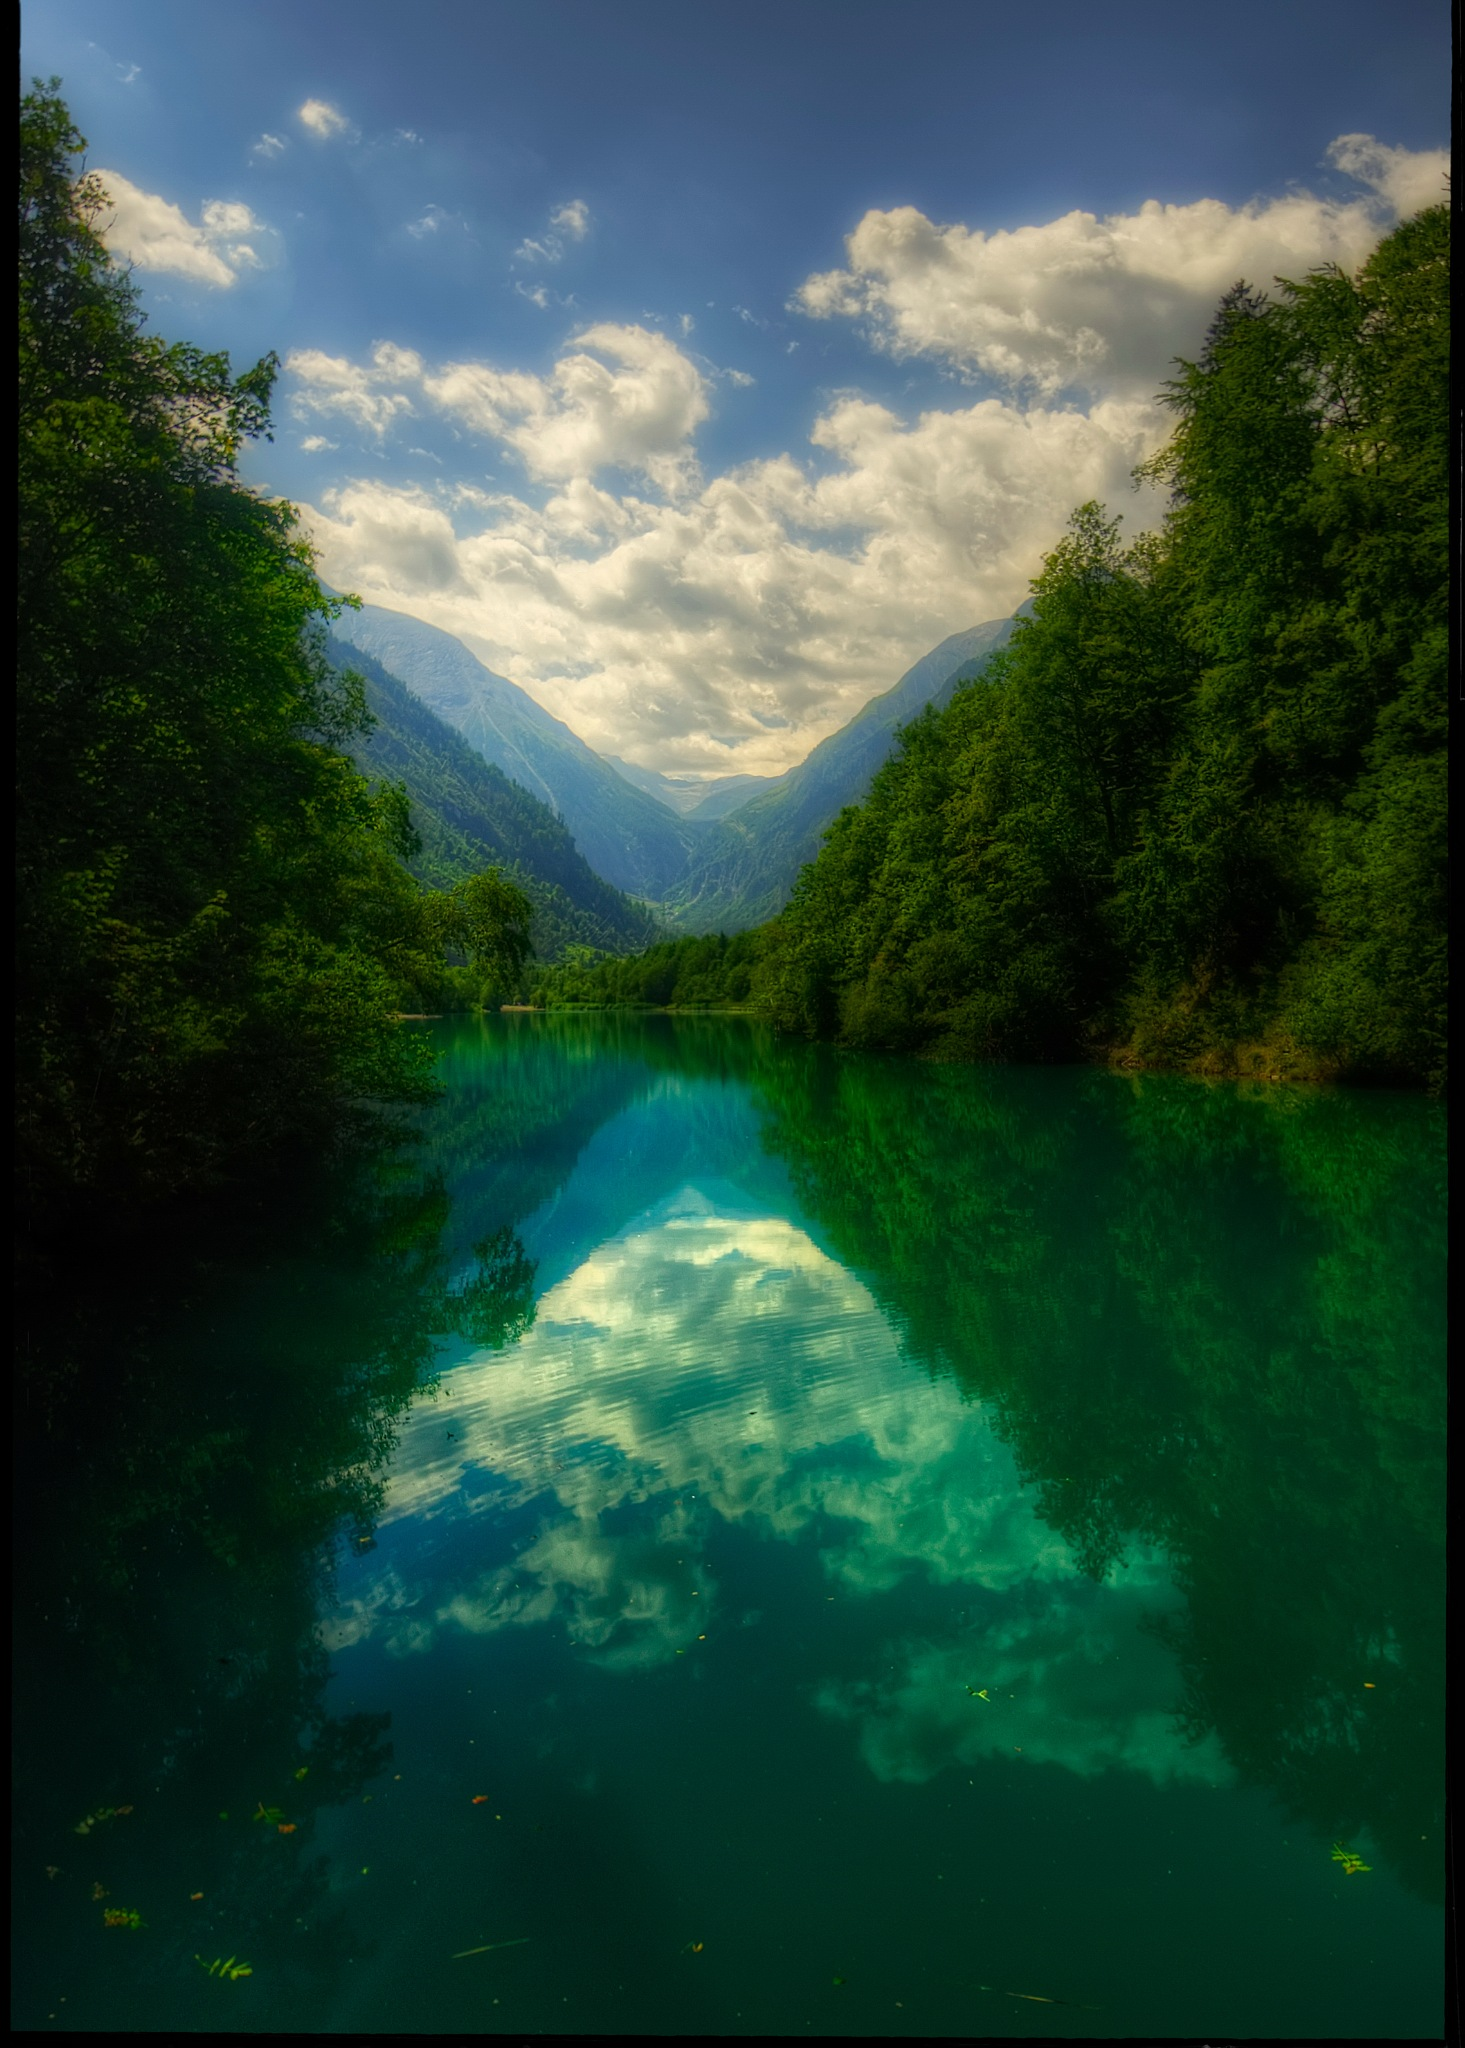 lake symetry by Petricek